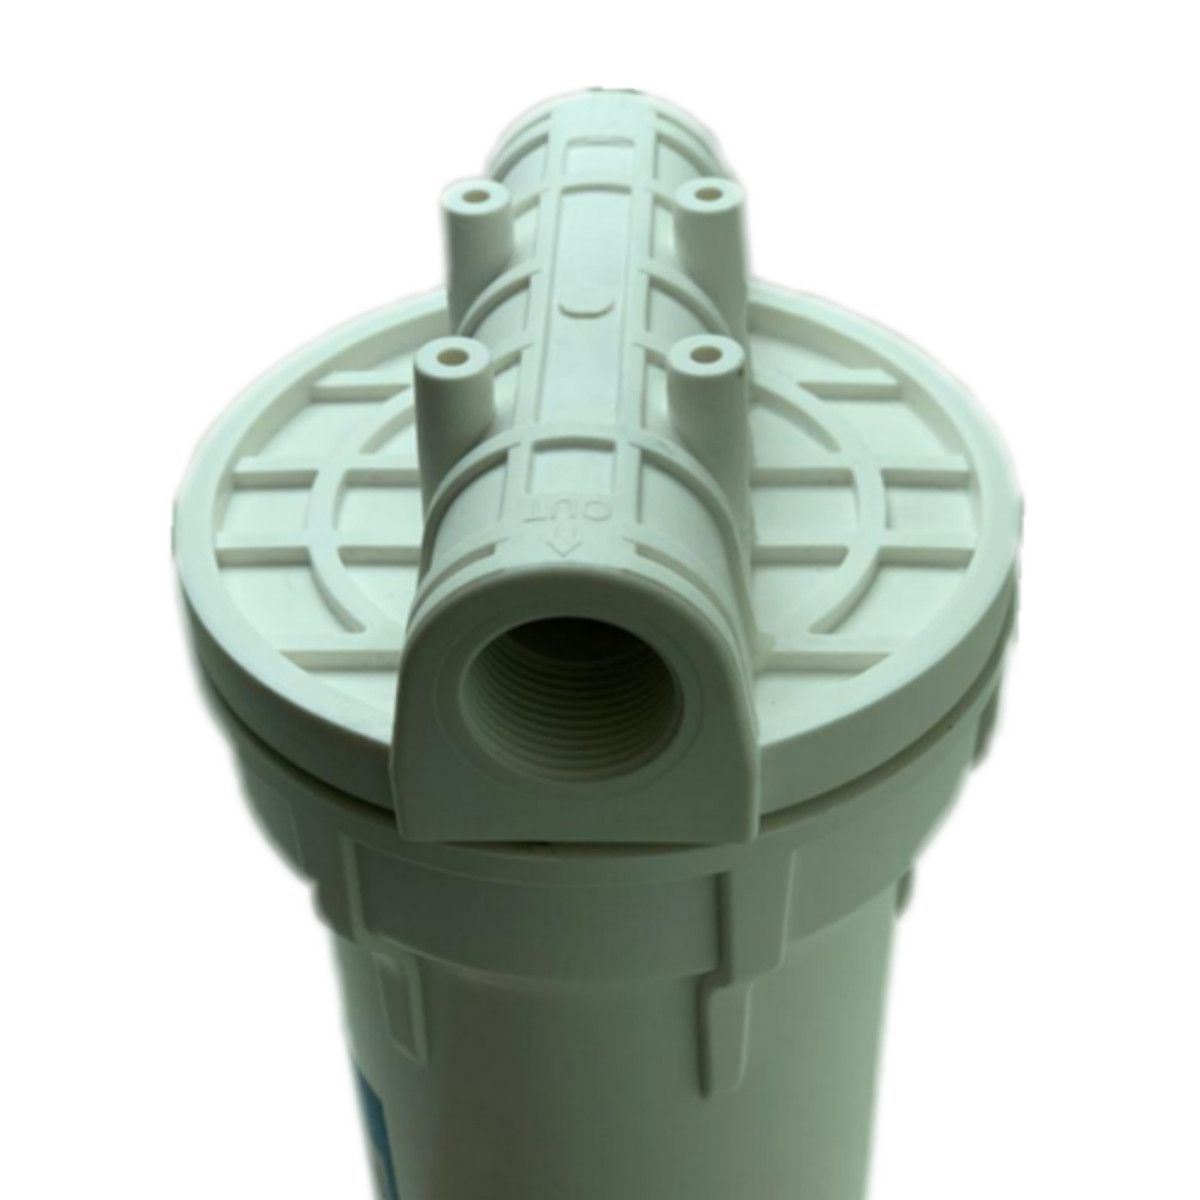 Filtro Água Completo P/ Caixa Dágua Cavalete De Entrada 9